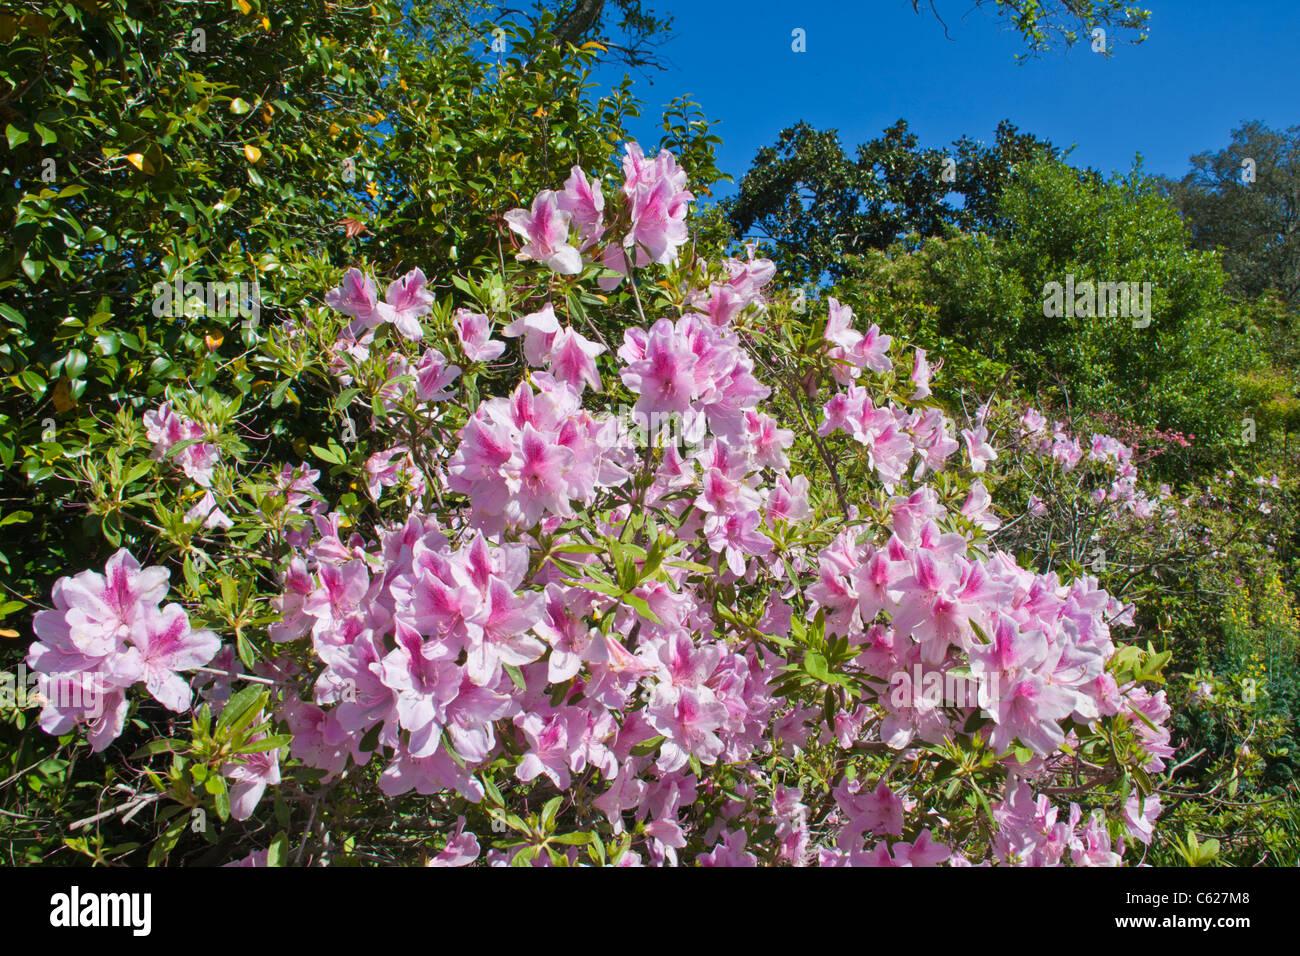 Azaleas in bloom at Bellingrath Gardens near Moblie, Alabama in early spring. Stock Photo